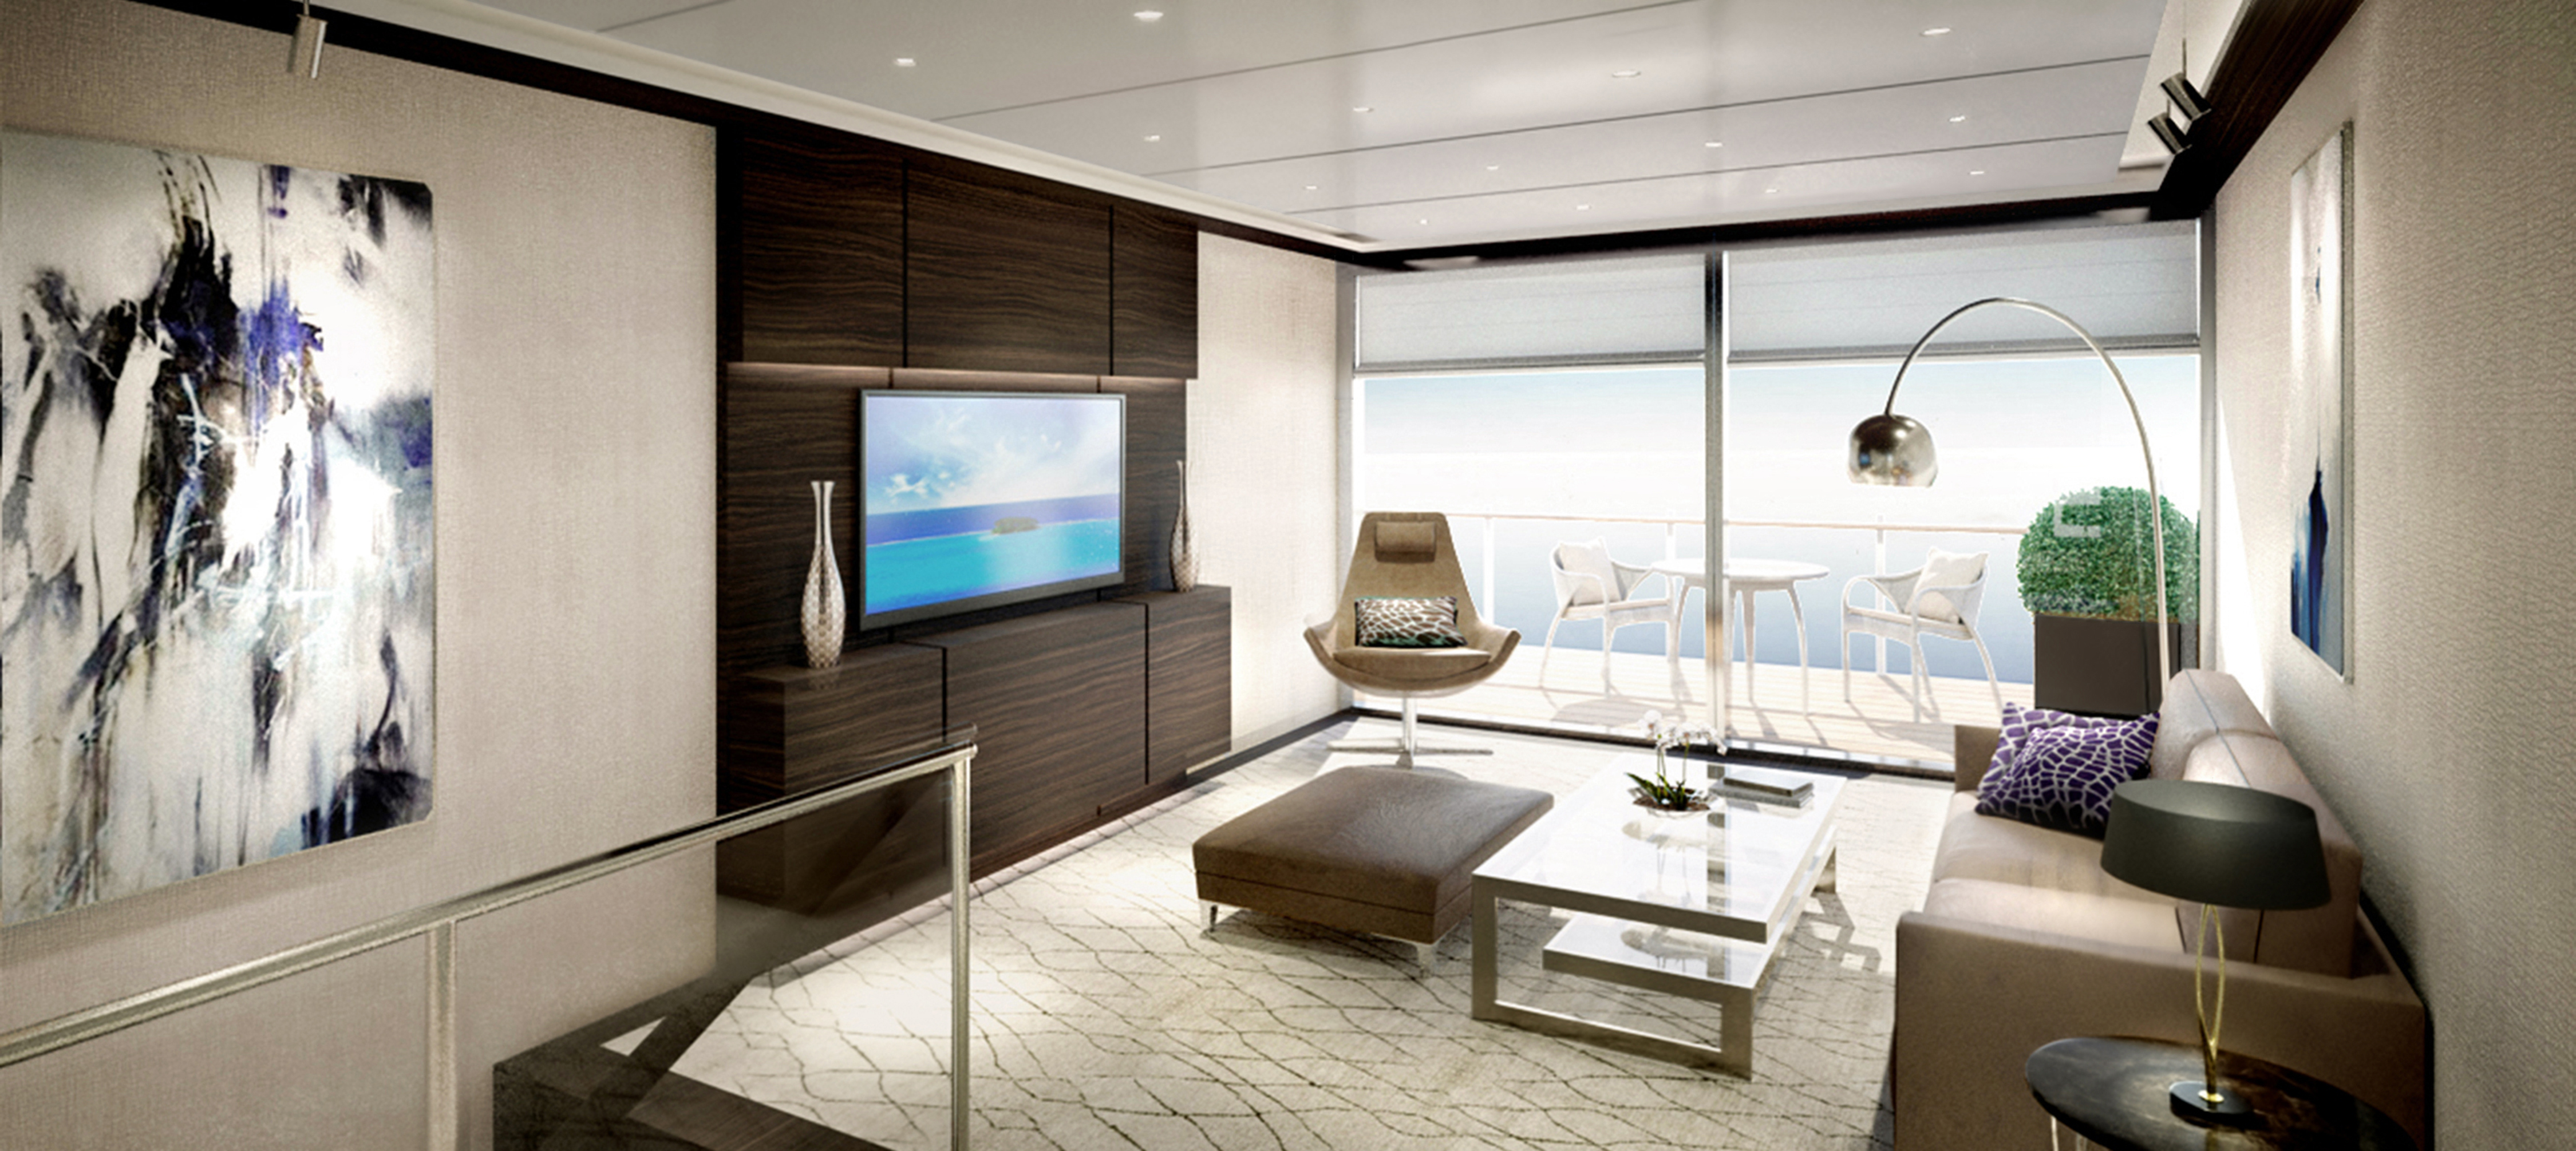 Duplex Suite, Ritz-Carlton yacht